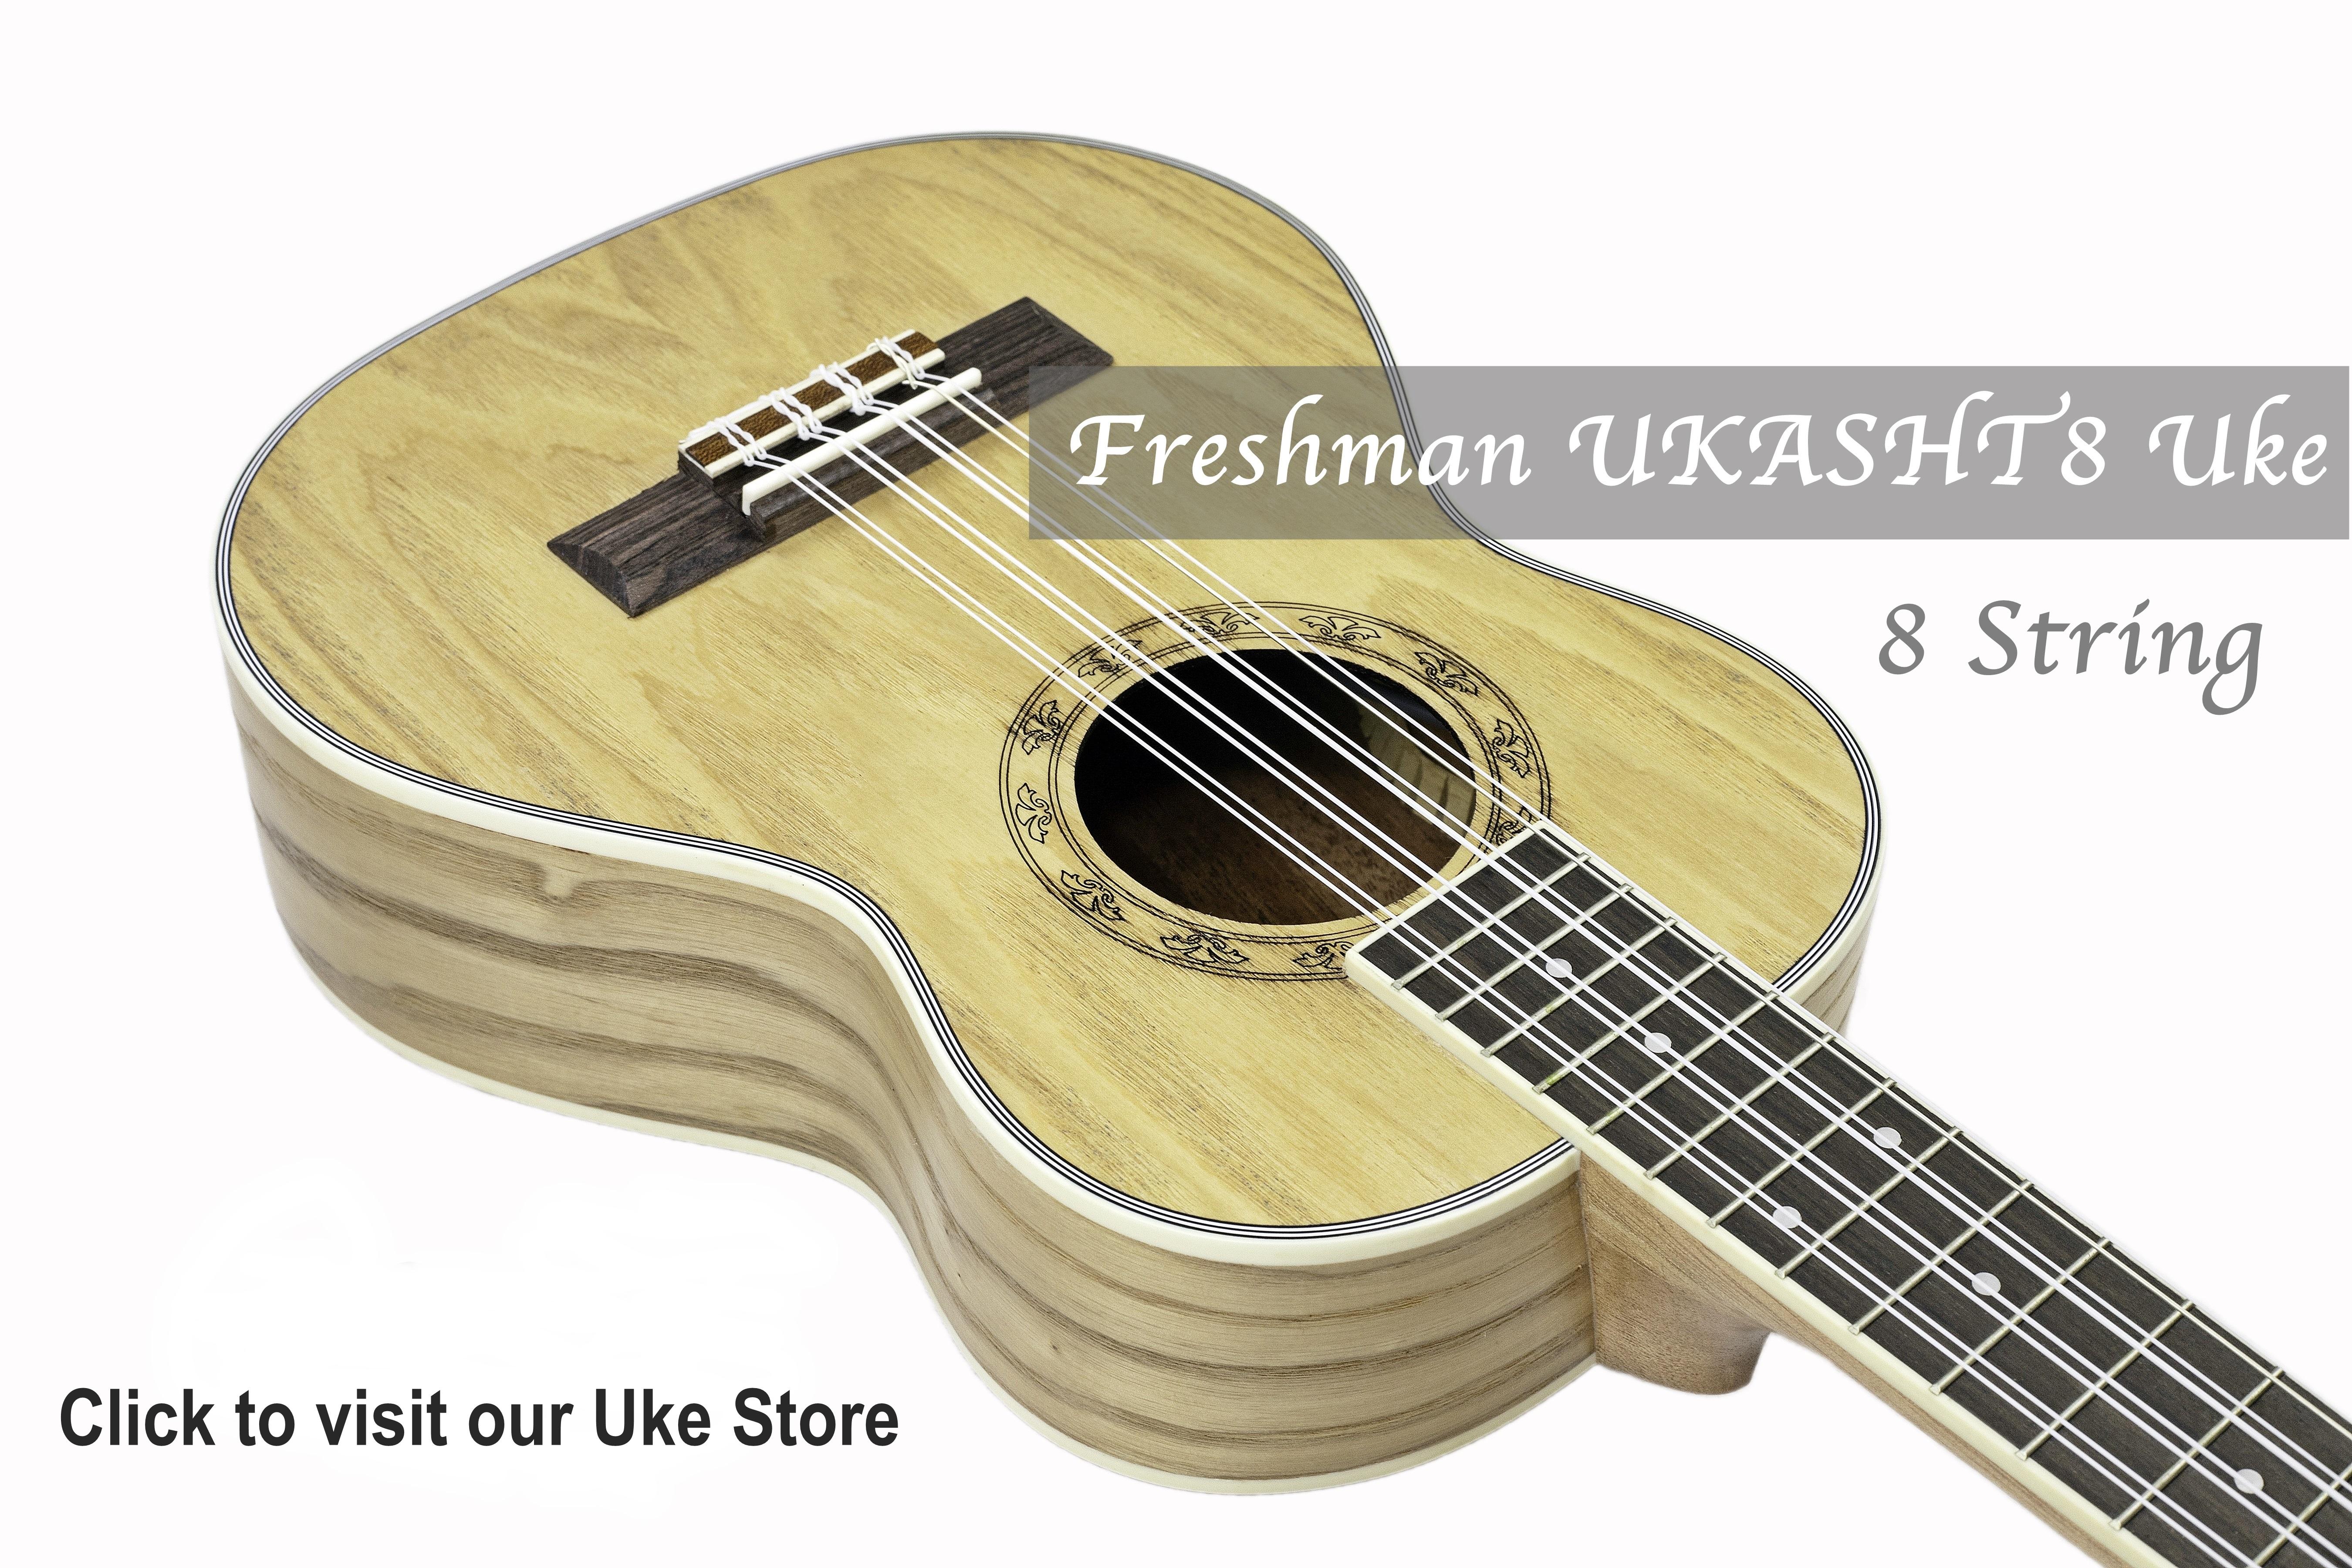 Freshman Guitars & Ukuleles